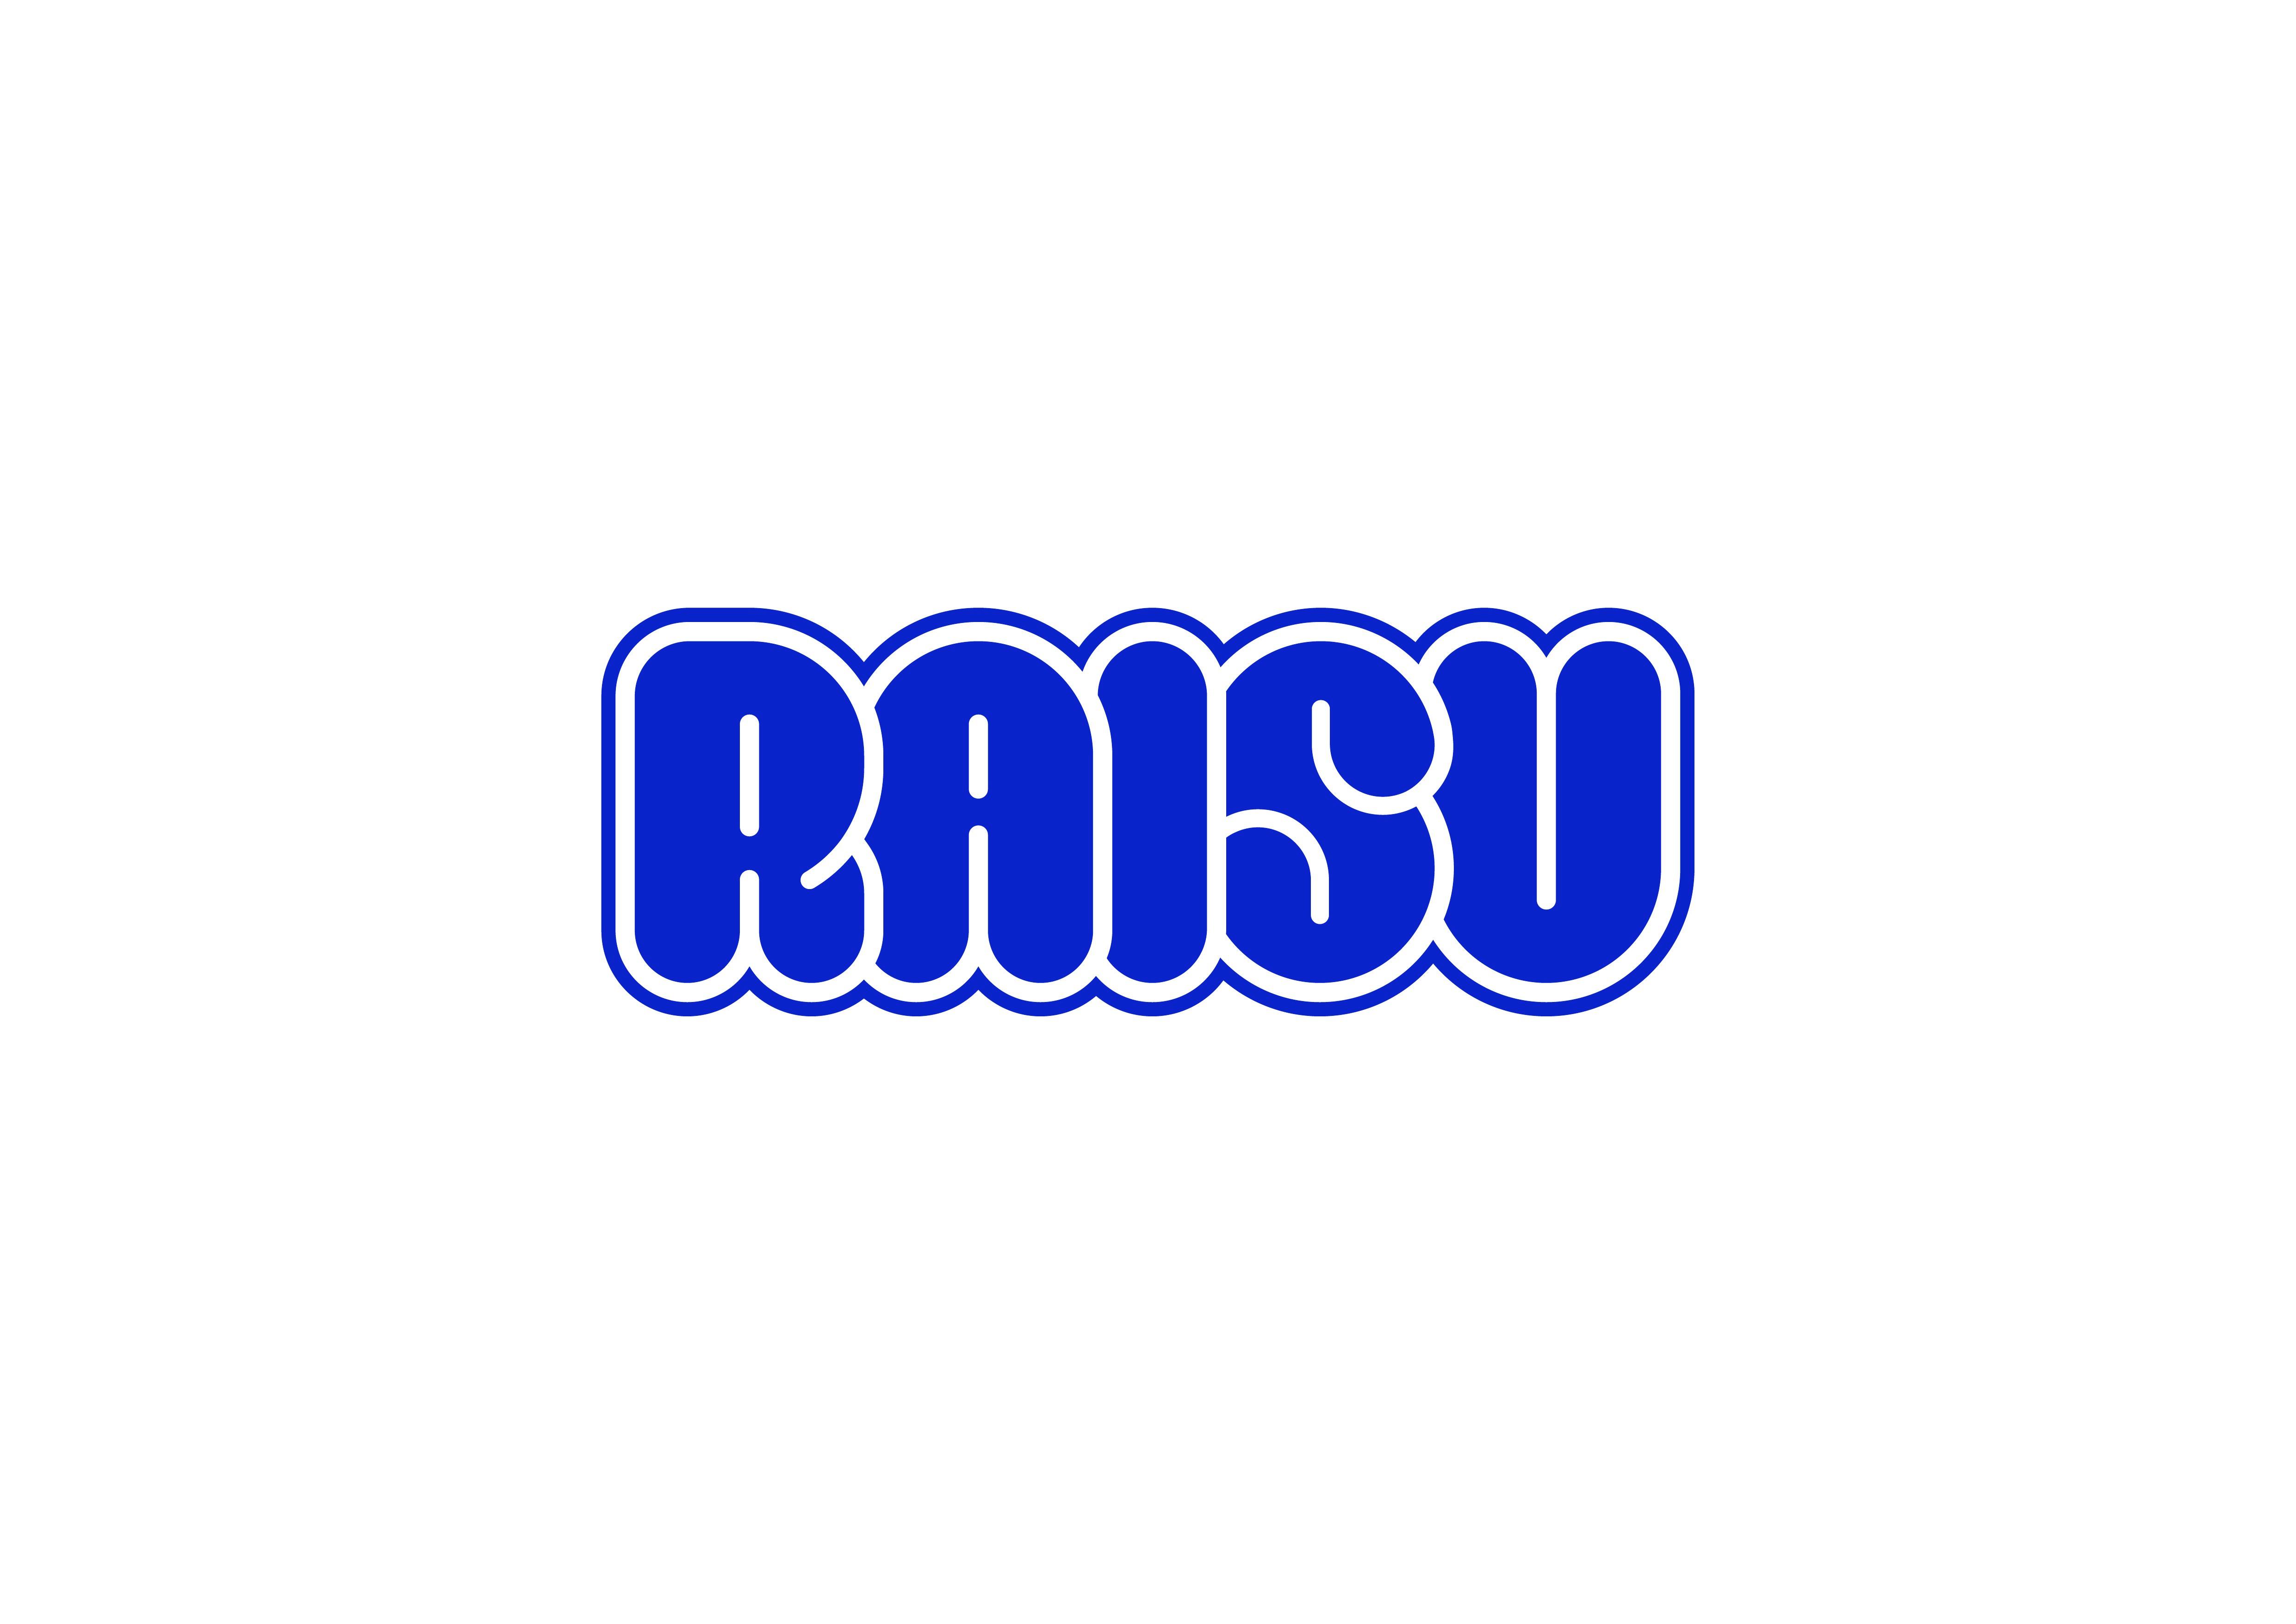 RAISU